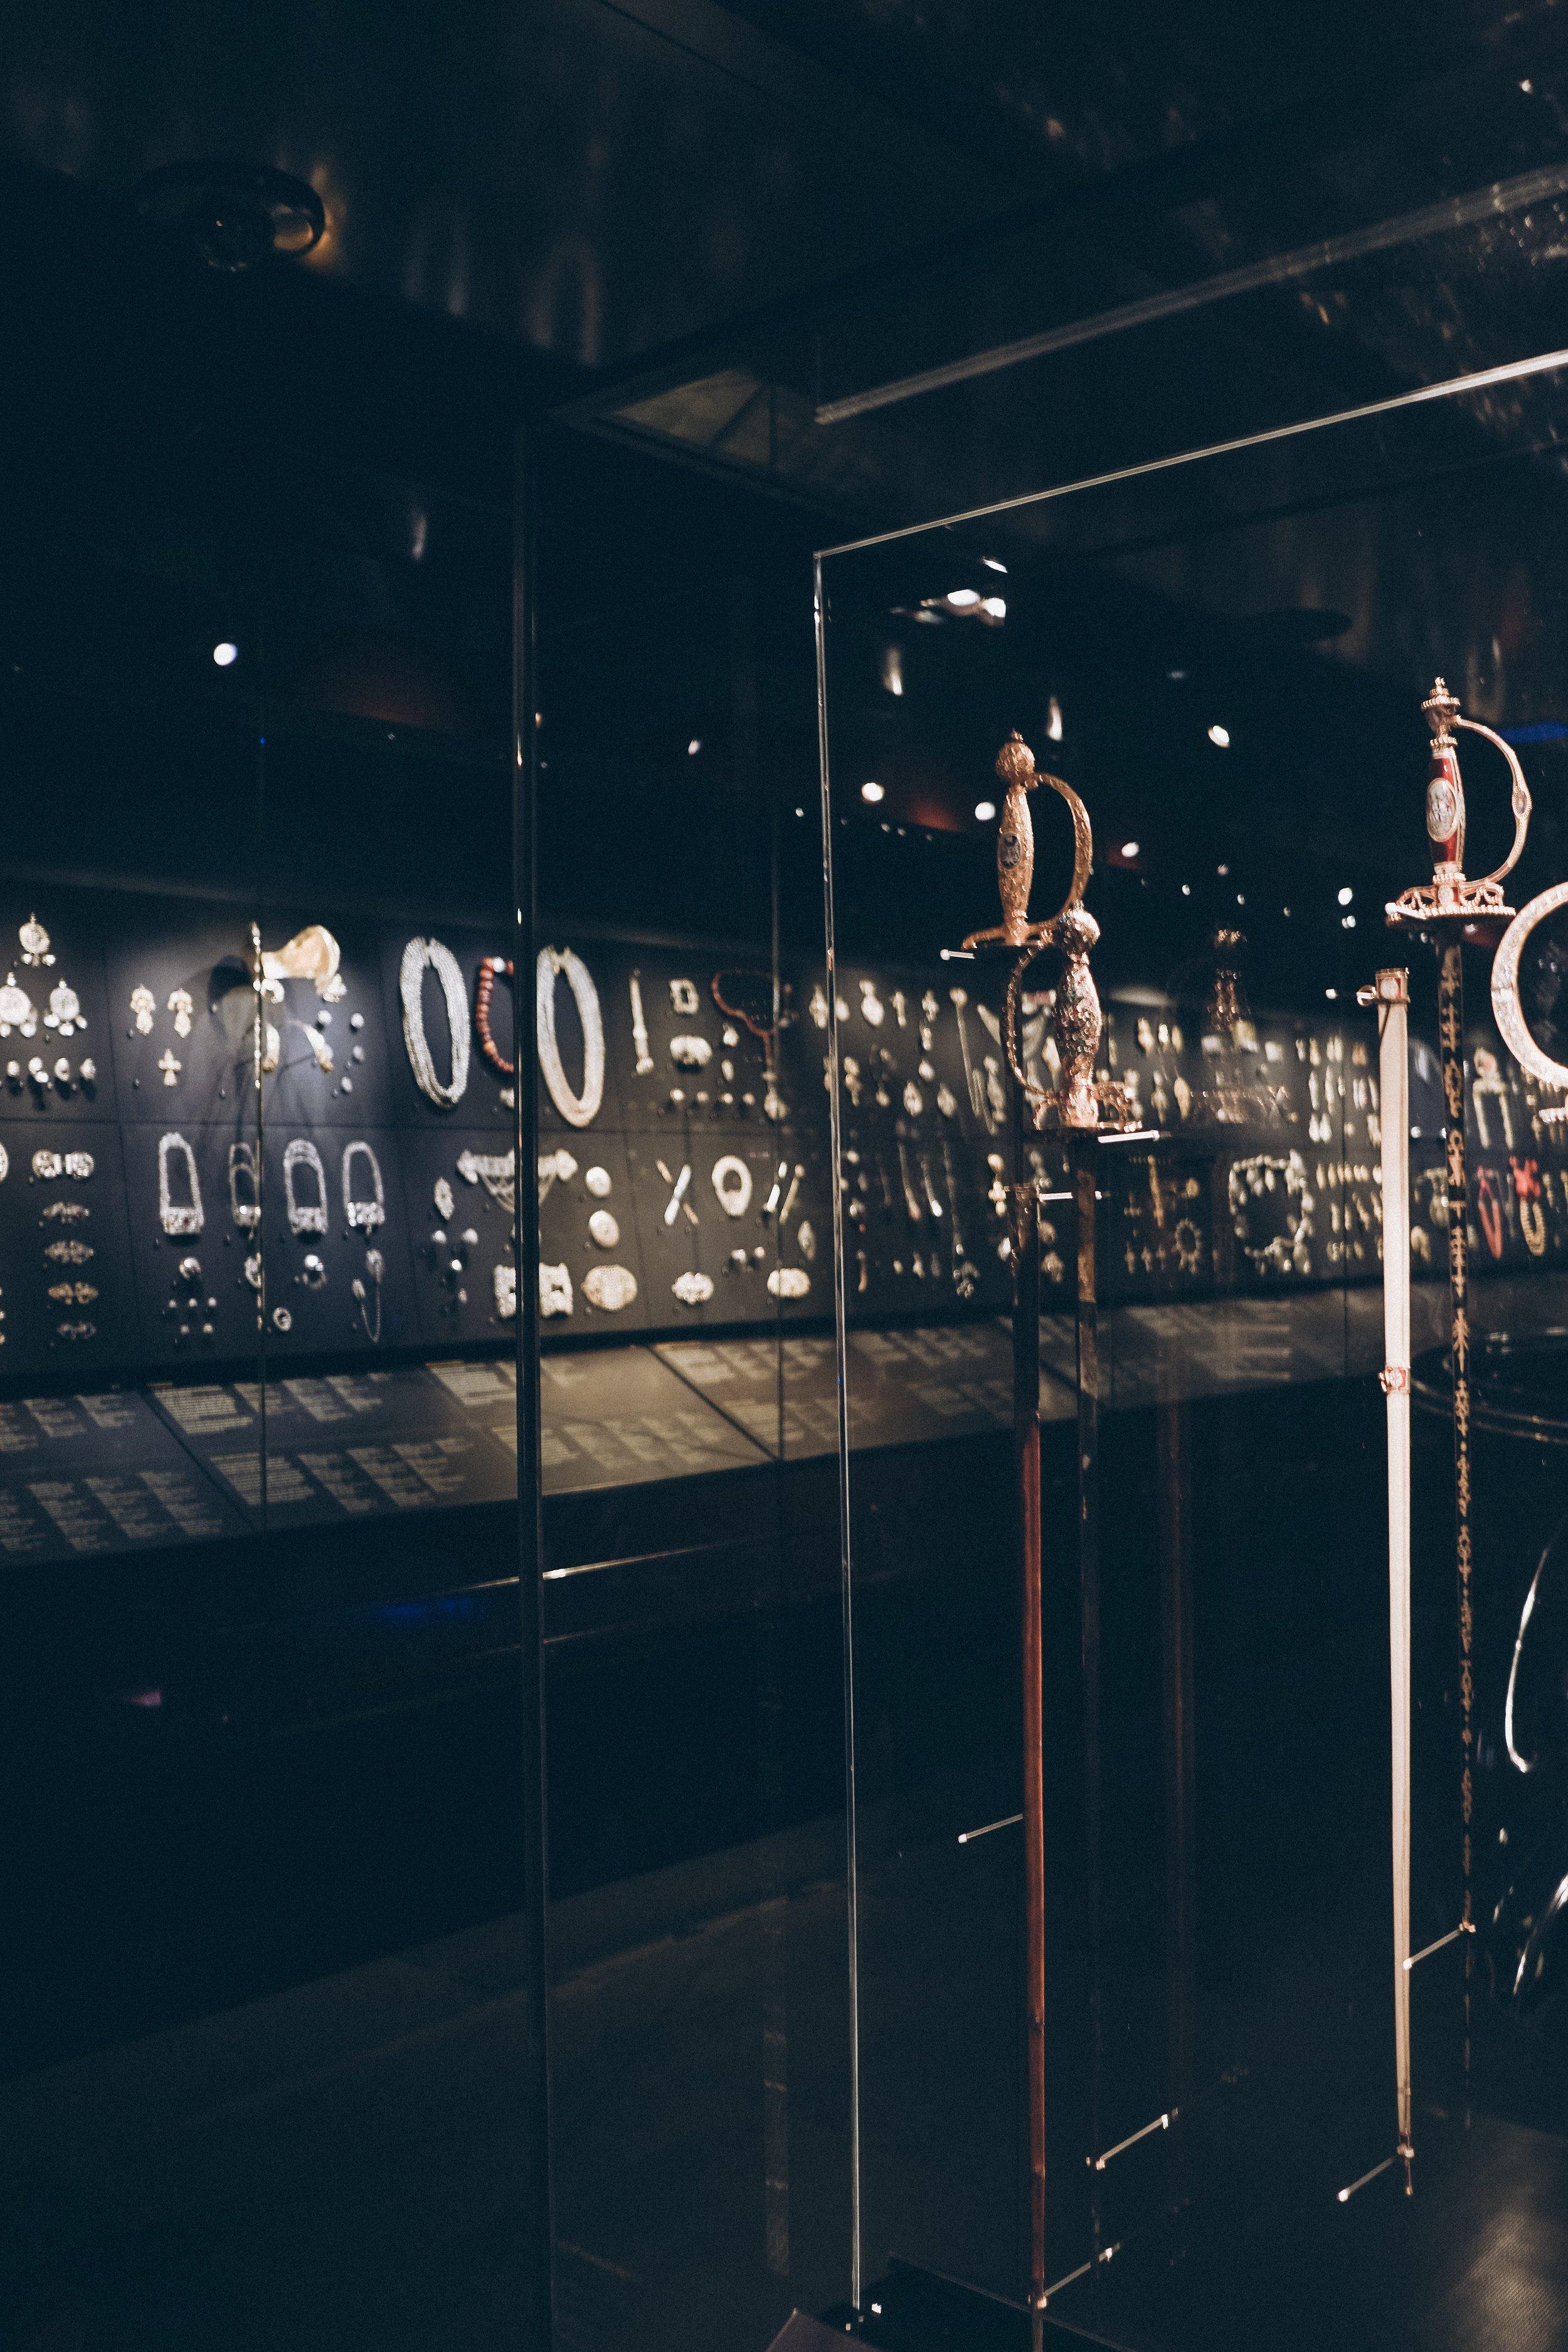 Victoria and Albert museum Summertime in London Julia Friedman